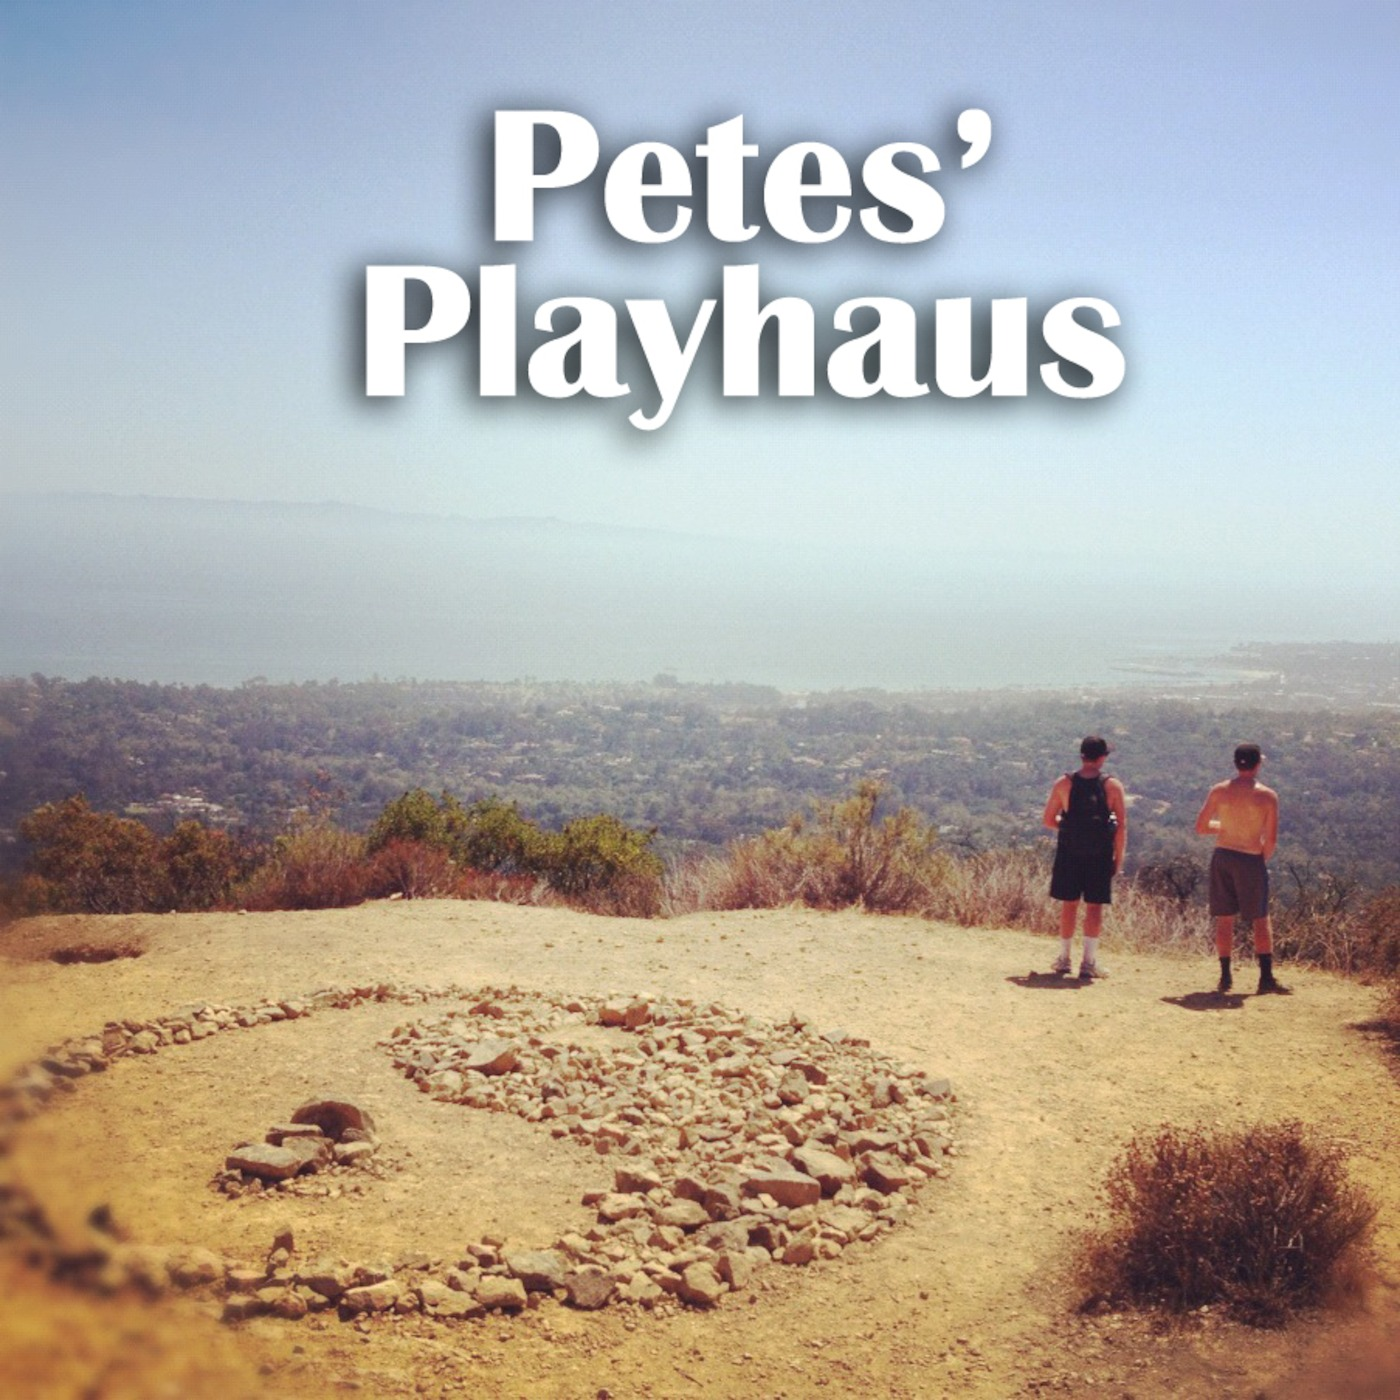 Petes' Playaus